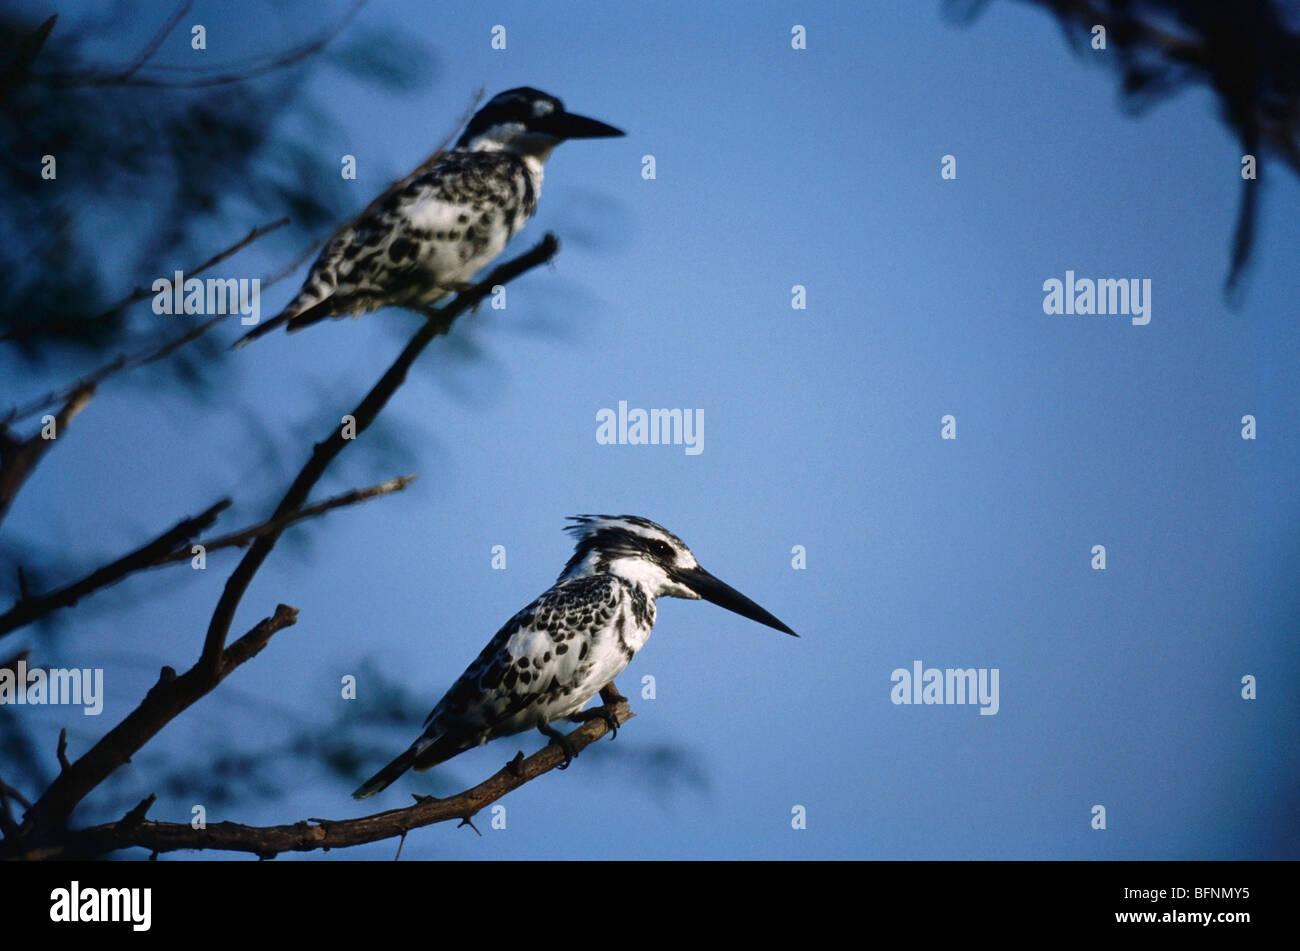 PRM 60051 : Birds ; Lesser pied kingfisher pair ceryle rudis ; Bharatpur national park  ; Rajasthan ; India - Stock Image